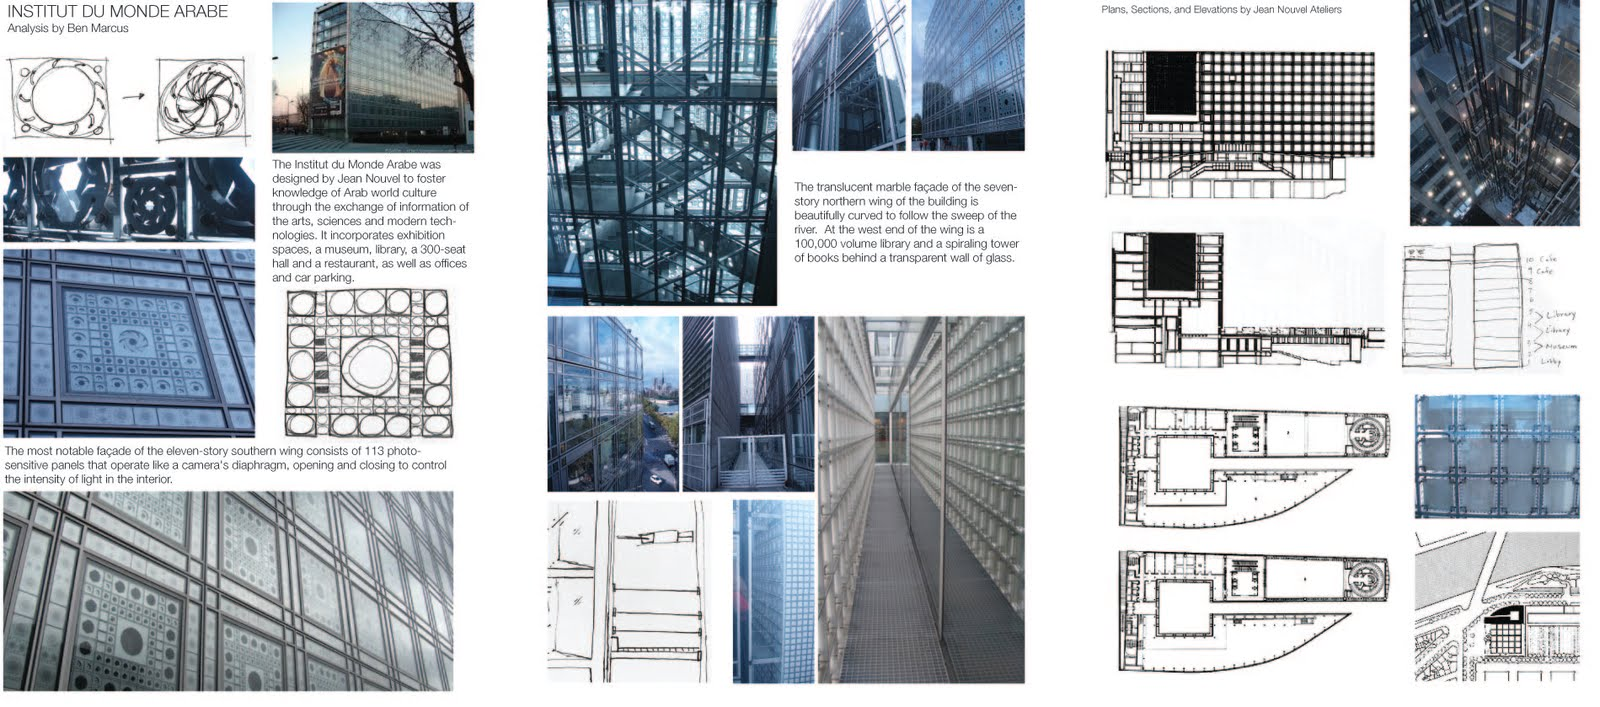 Ambassade du design institut du monde arabe france for Architecture arabe